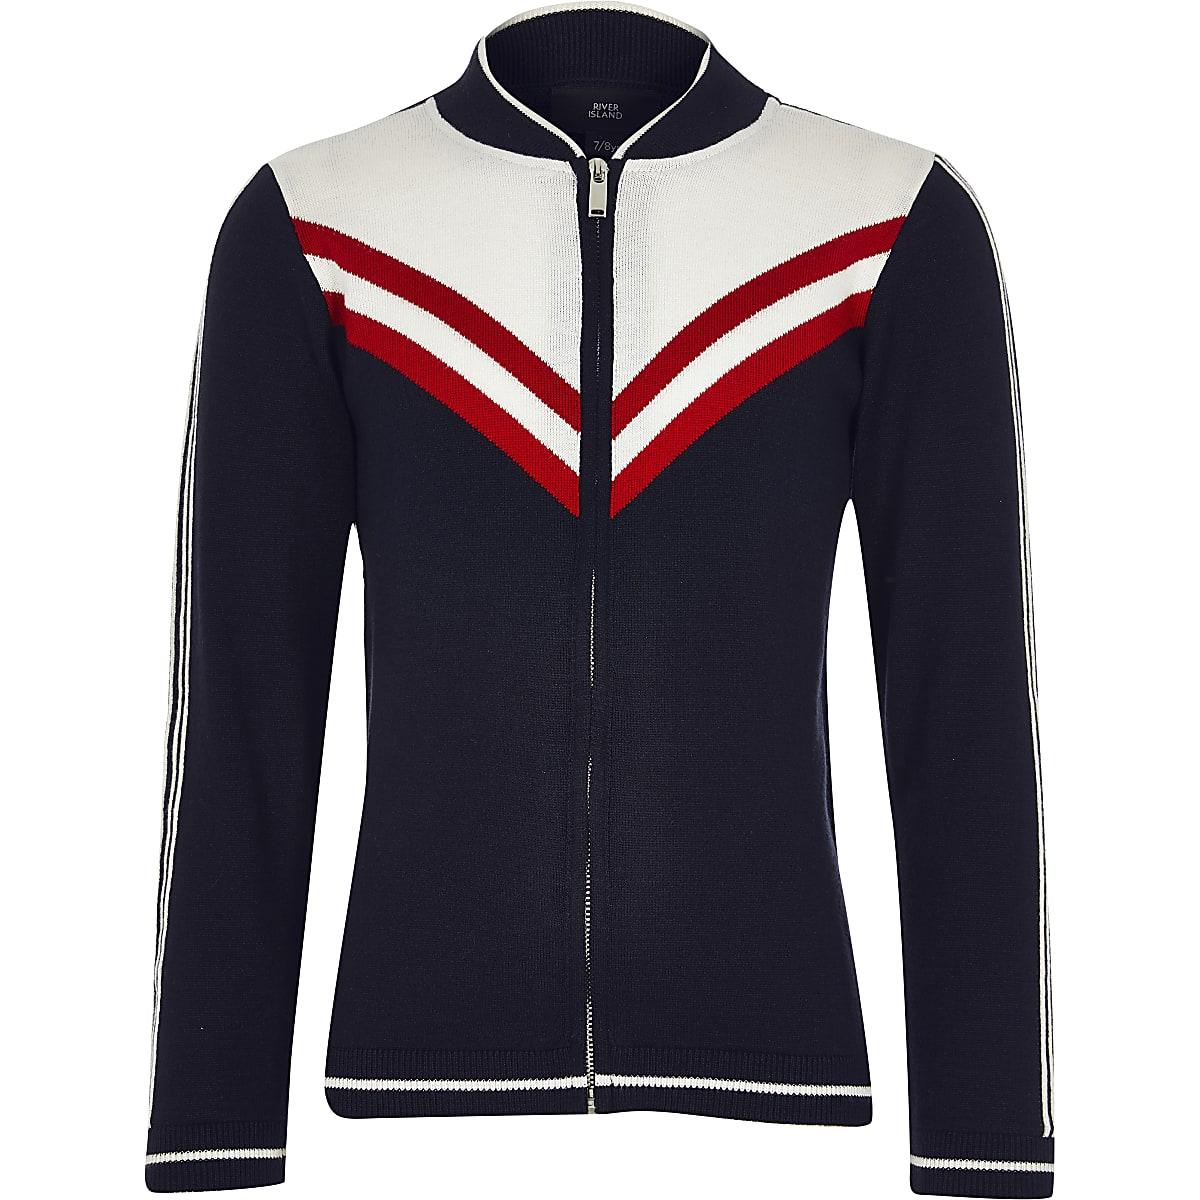 Boys navy chevron knit bomber jacket